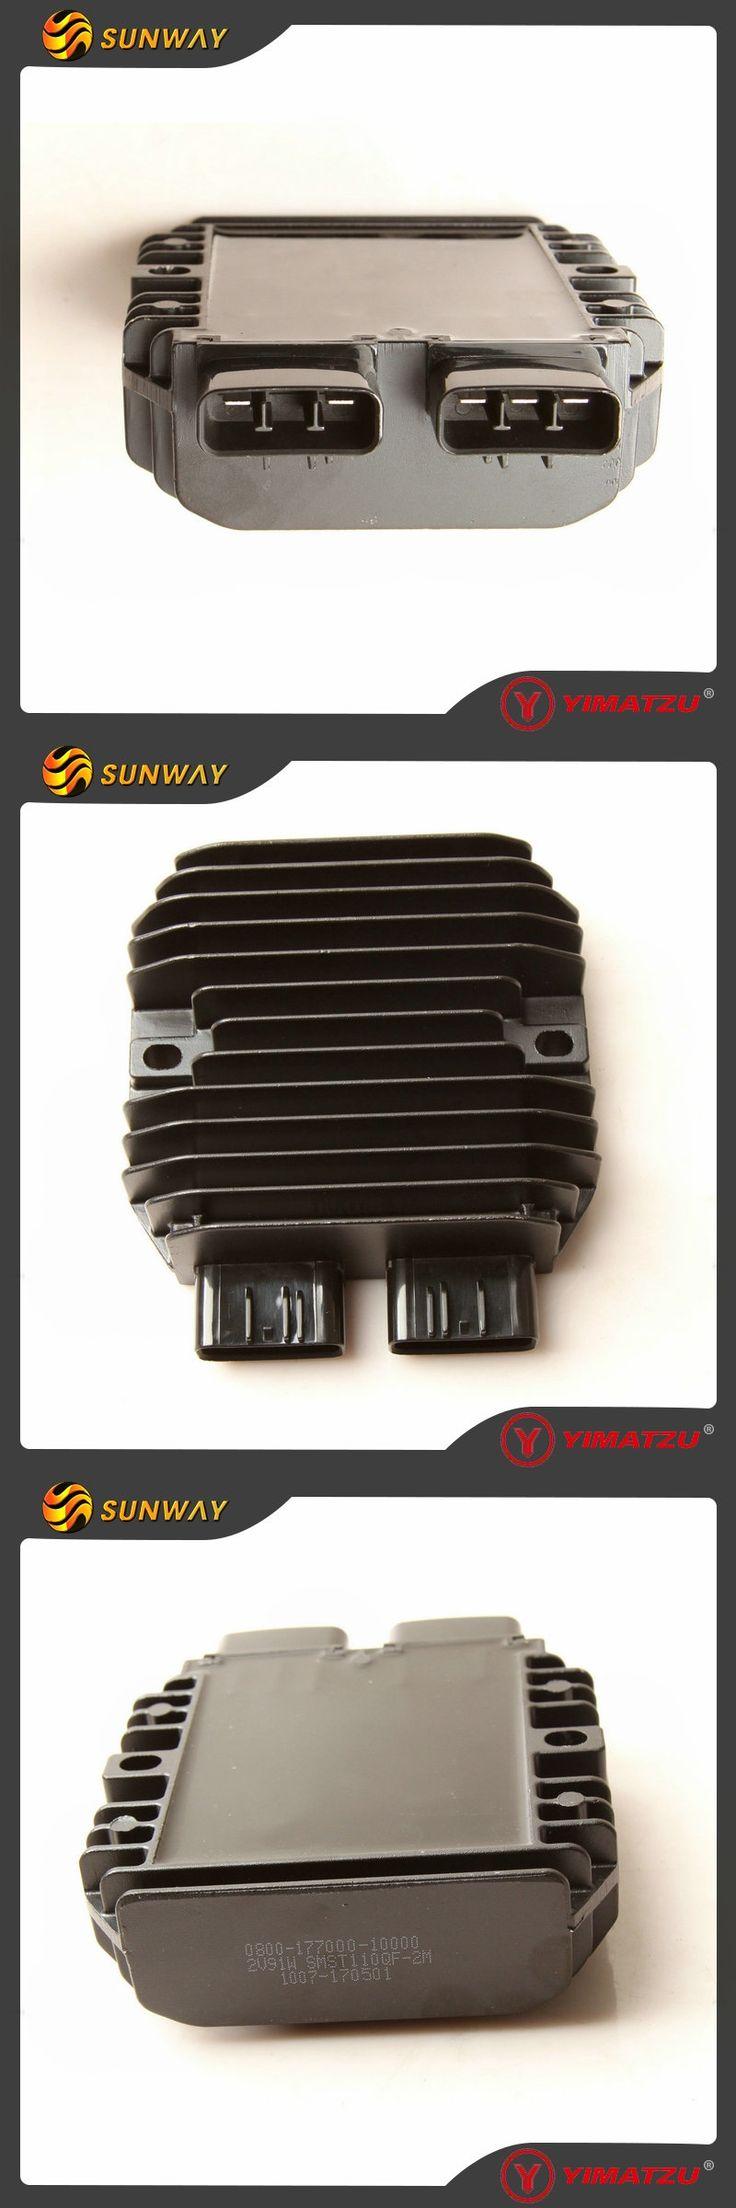 SUNWAY ATV Quad Bike Parts Voltage Stabilizer for CFMOTO CF800 X8 ATV Quad Bike Parts Number:0800-177000-10000 Free Shipping